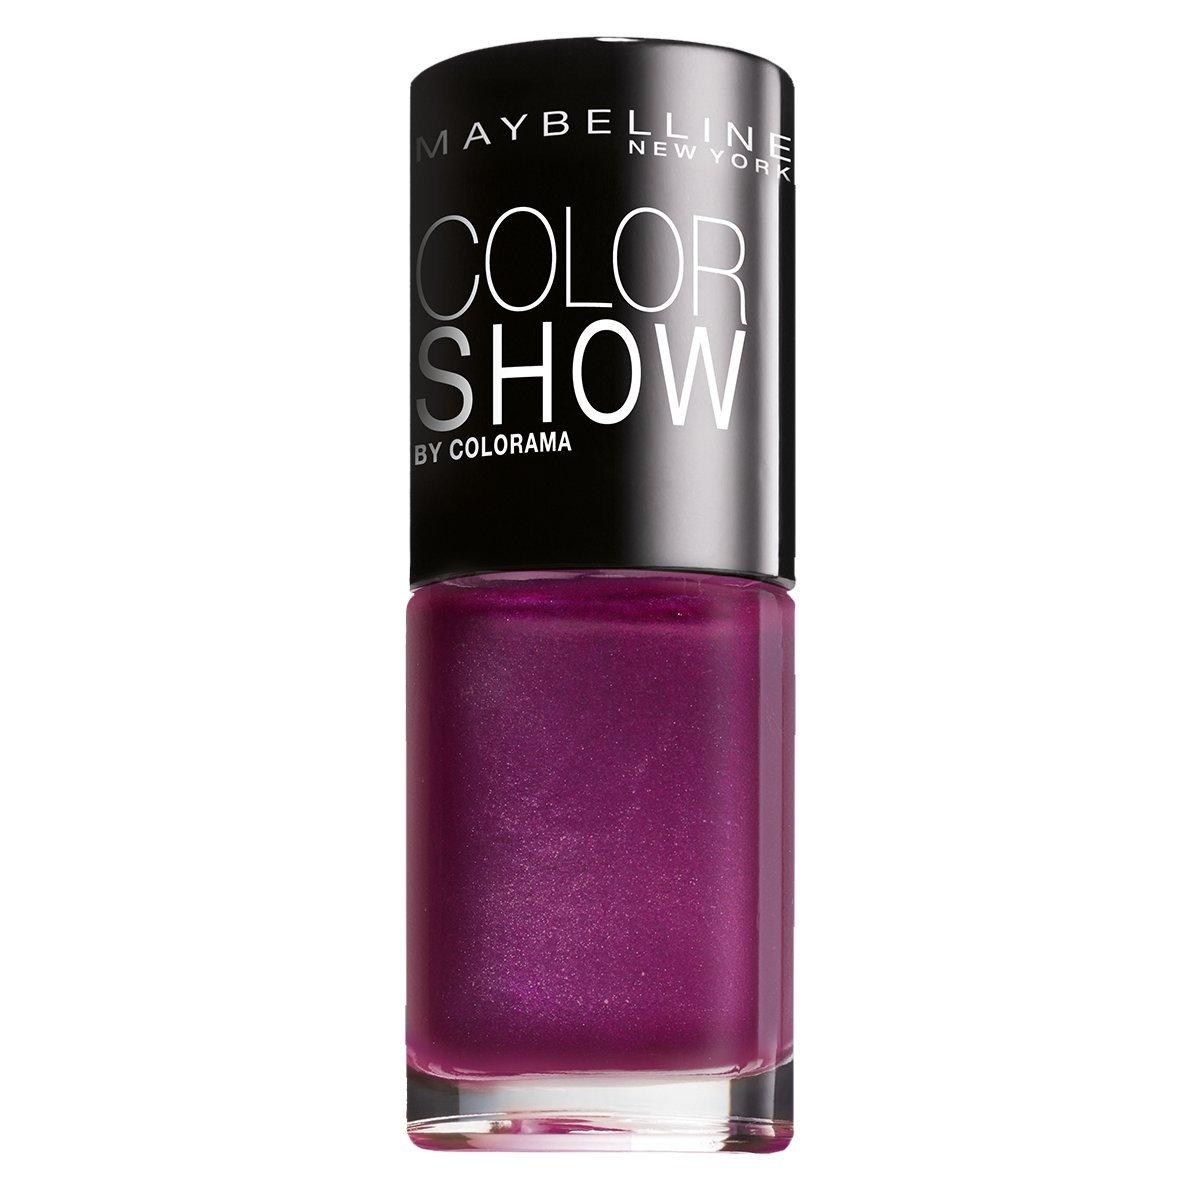 Maybelline New York Make-Up Nailpolish Color Show Nagellack Purple ...